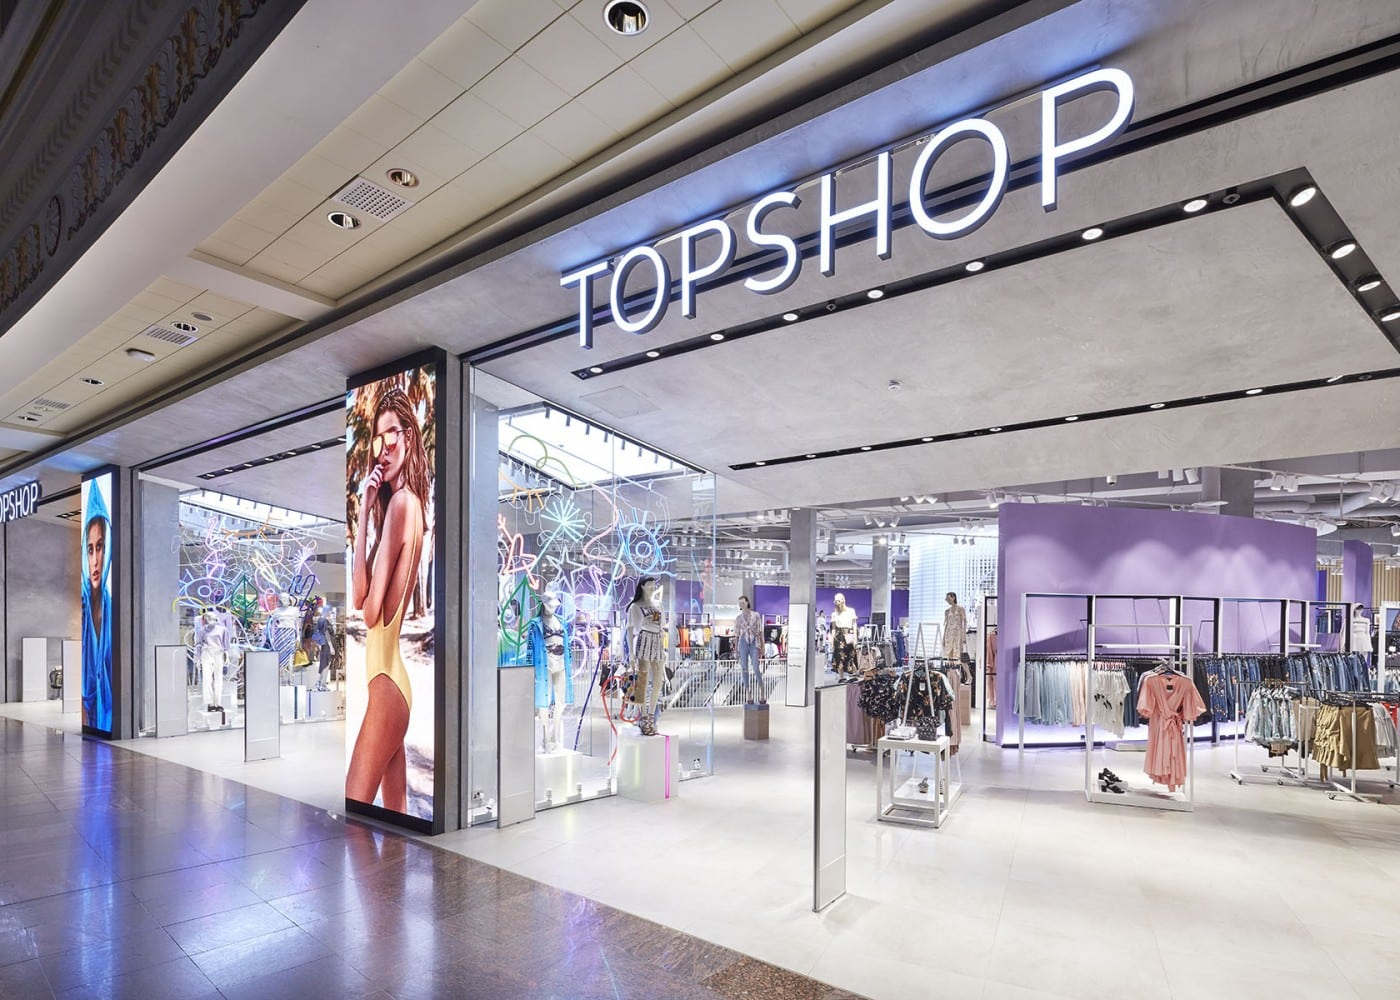 retail lighting design: Topshop exterior